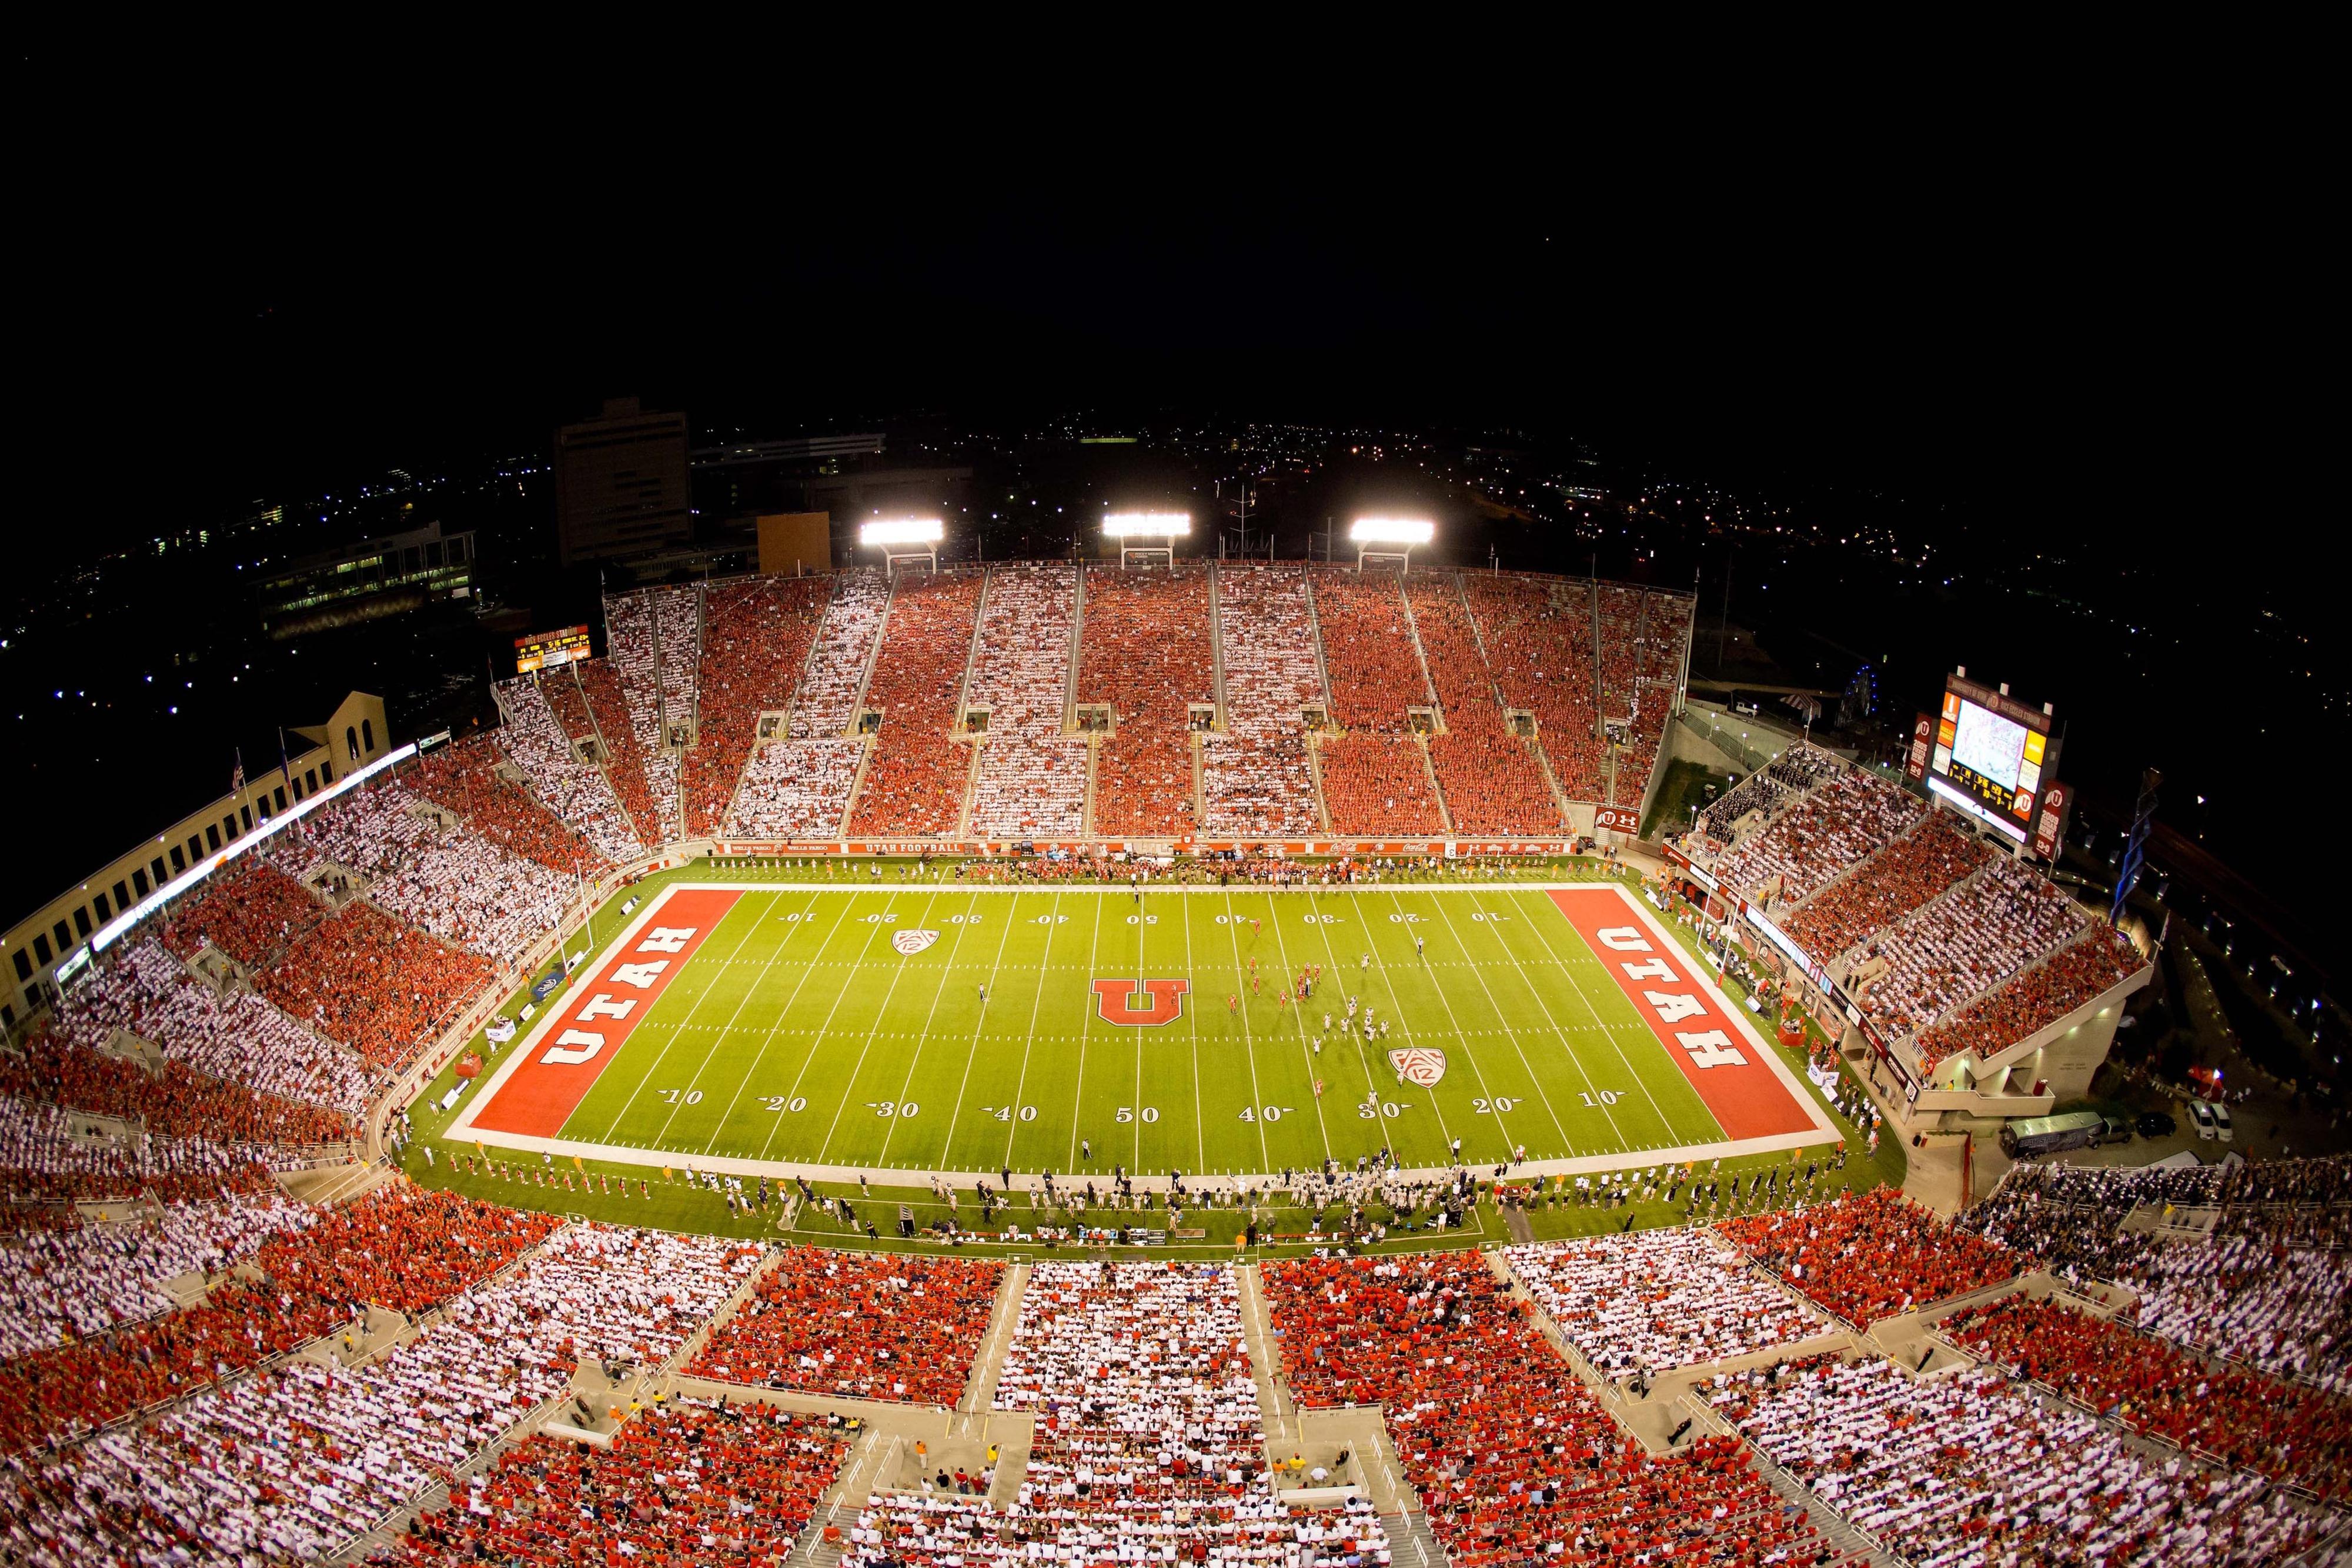 Utah kicks off 2014 with a 'Stripe the Stadium' game versus Idaho State.